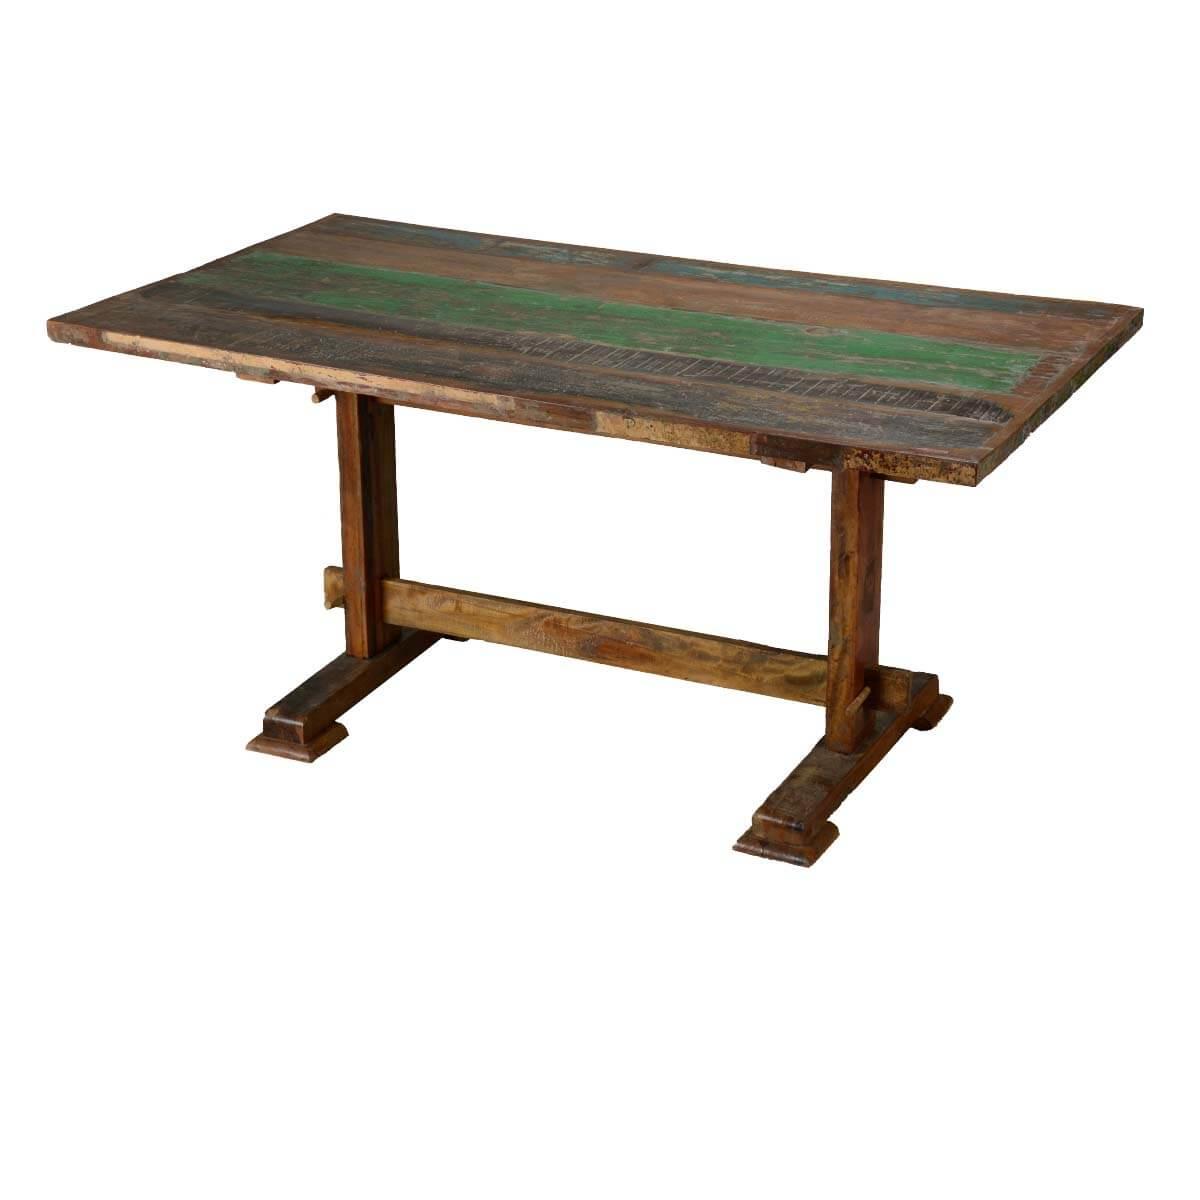 reclaimed hardwood classic trestle pedestal dining table. Black Bedroom Furniture Sets. Home Design Ideas